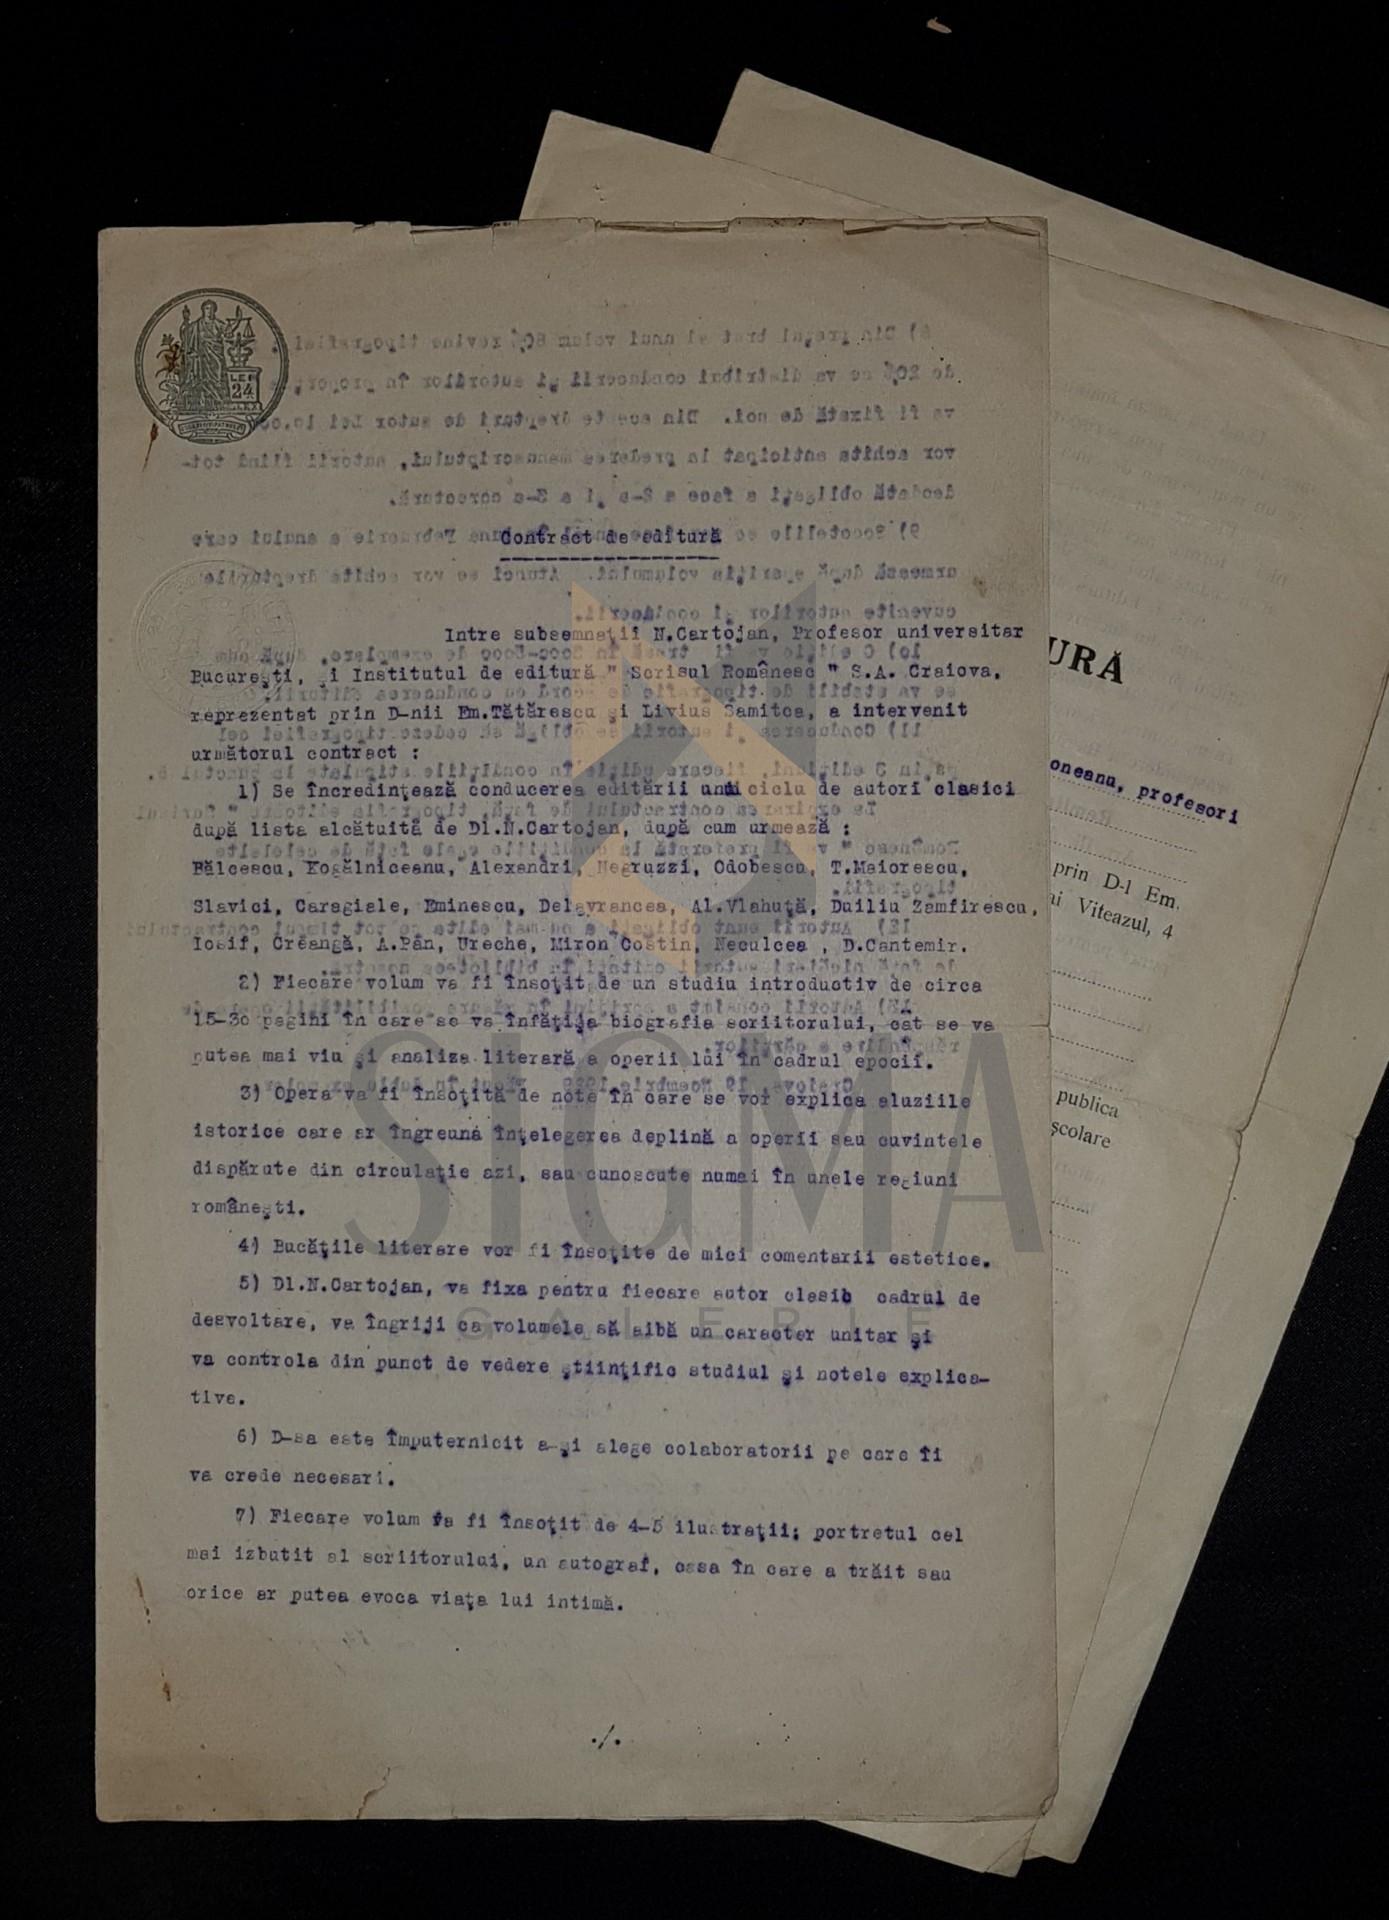 LOT DOCUMENTE, CONTRACT DE EDITURA NICOLAE CARTOJAN si A. RADULESCU-POGONEANU (Profesori Universitari), 1929-1936, Craiova